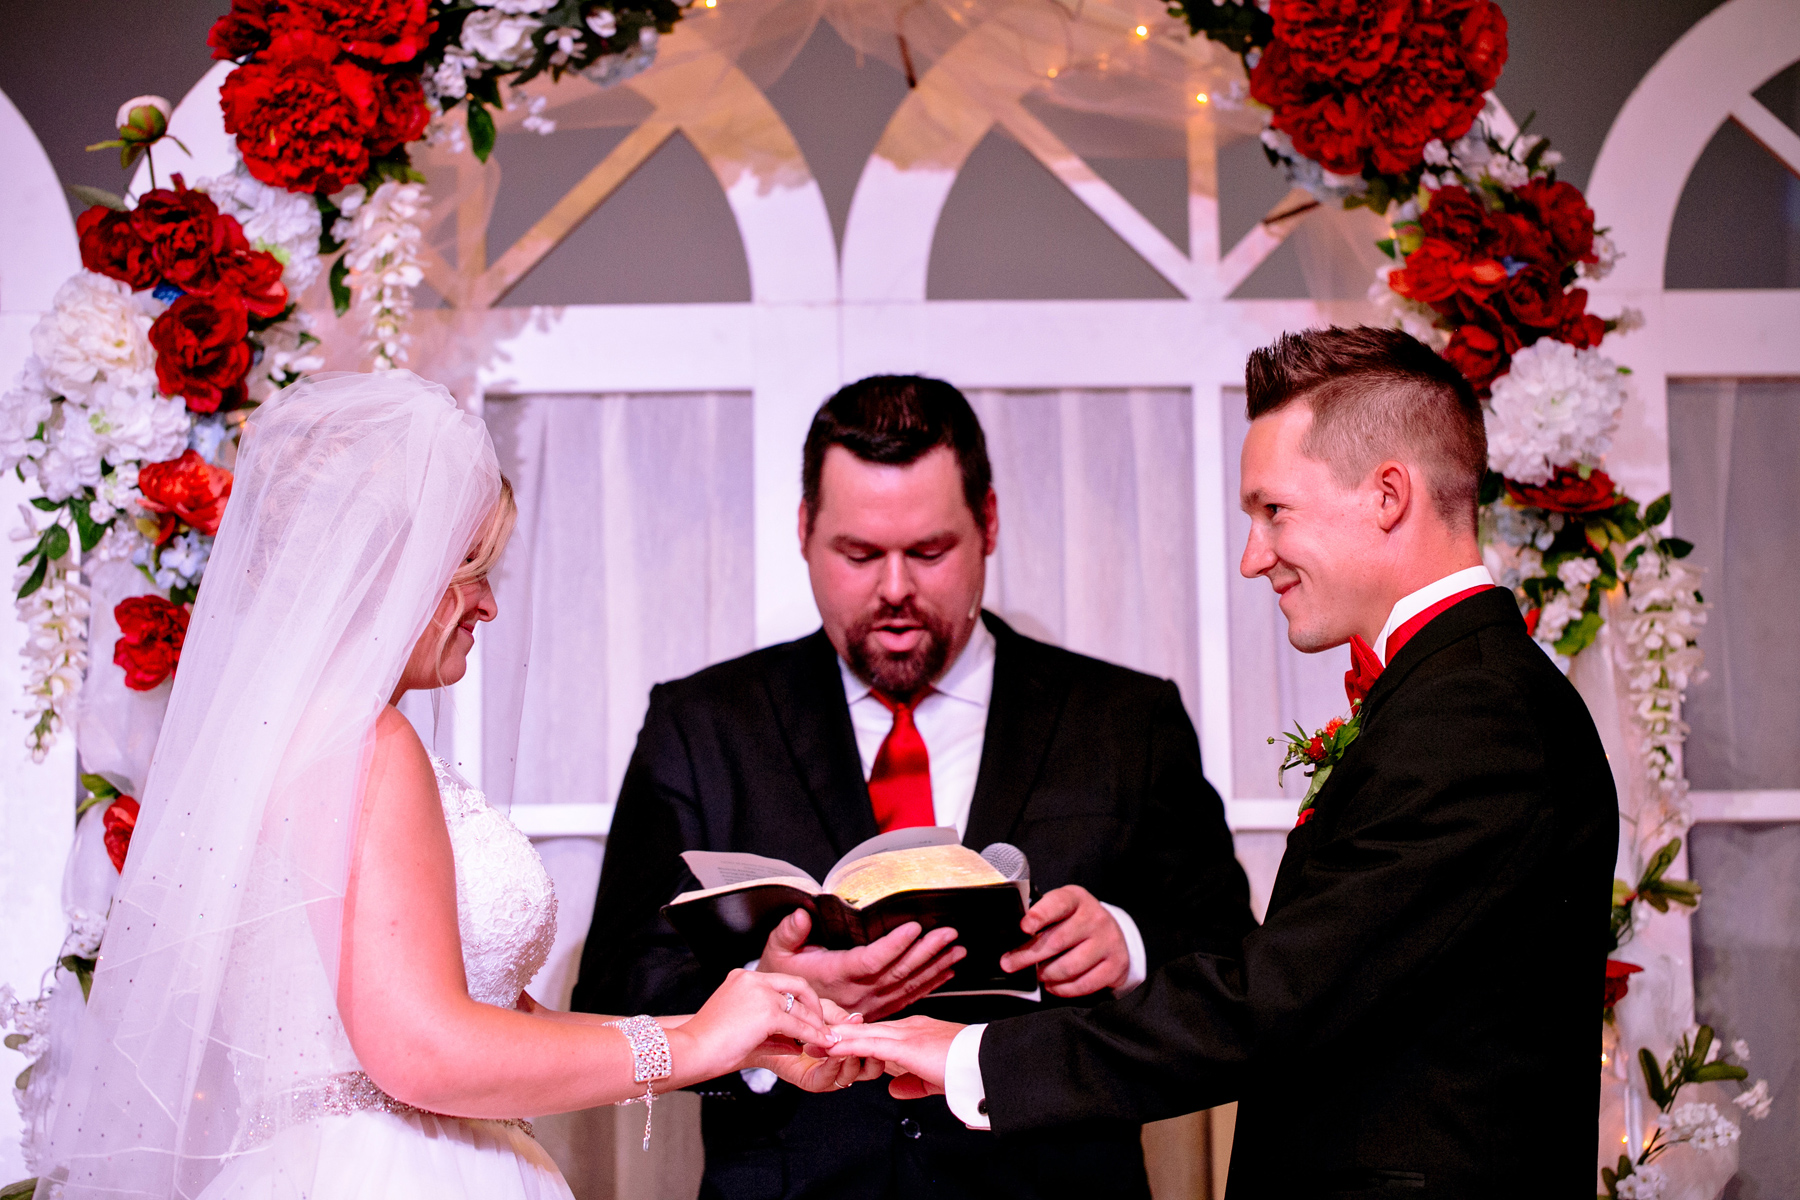 022-awesome-pei-wedding-photography-kandisebrown-jg2016